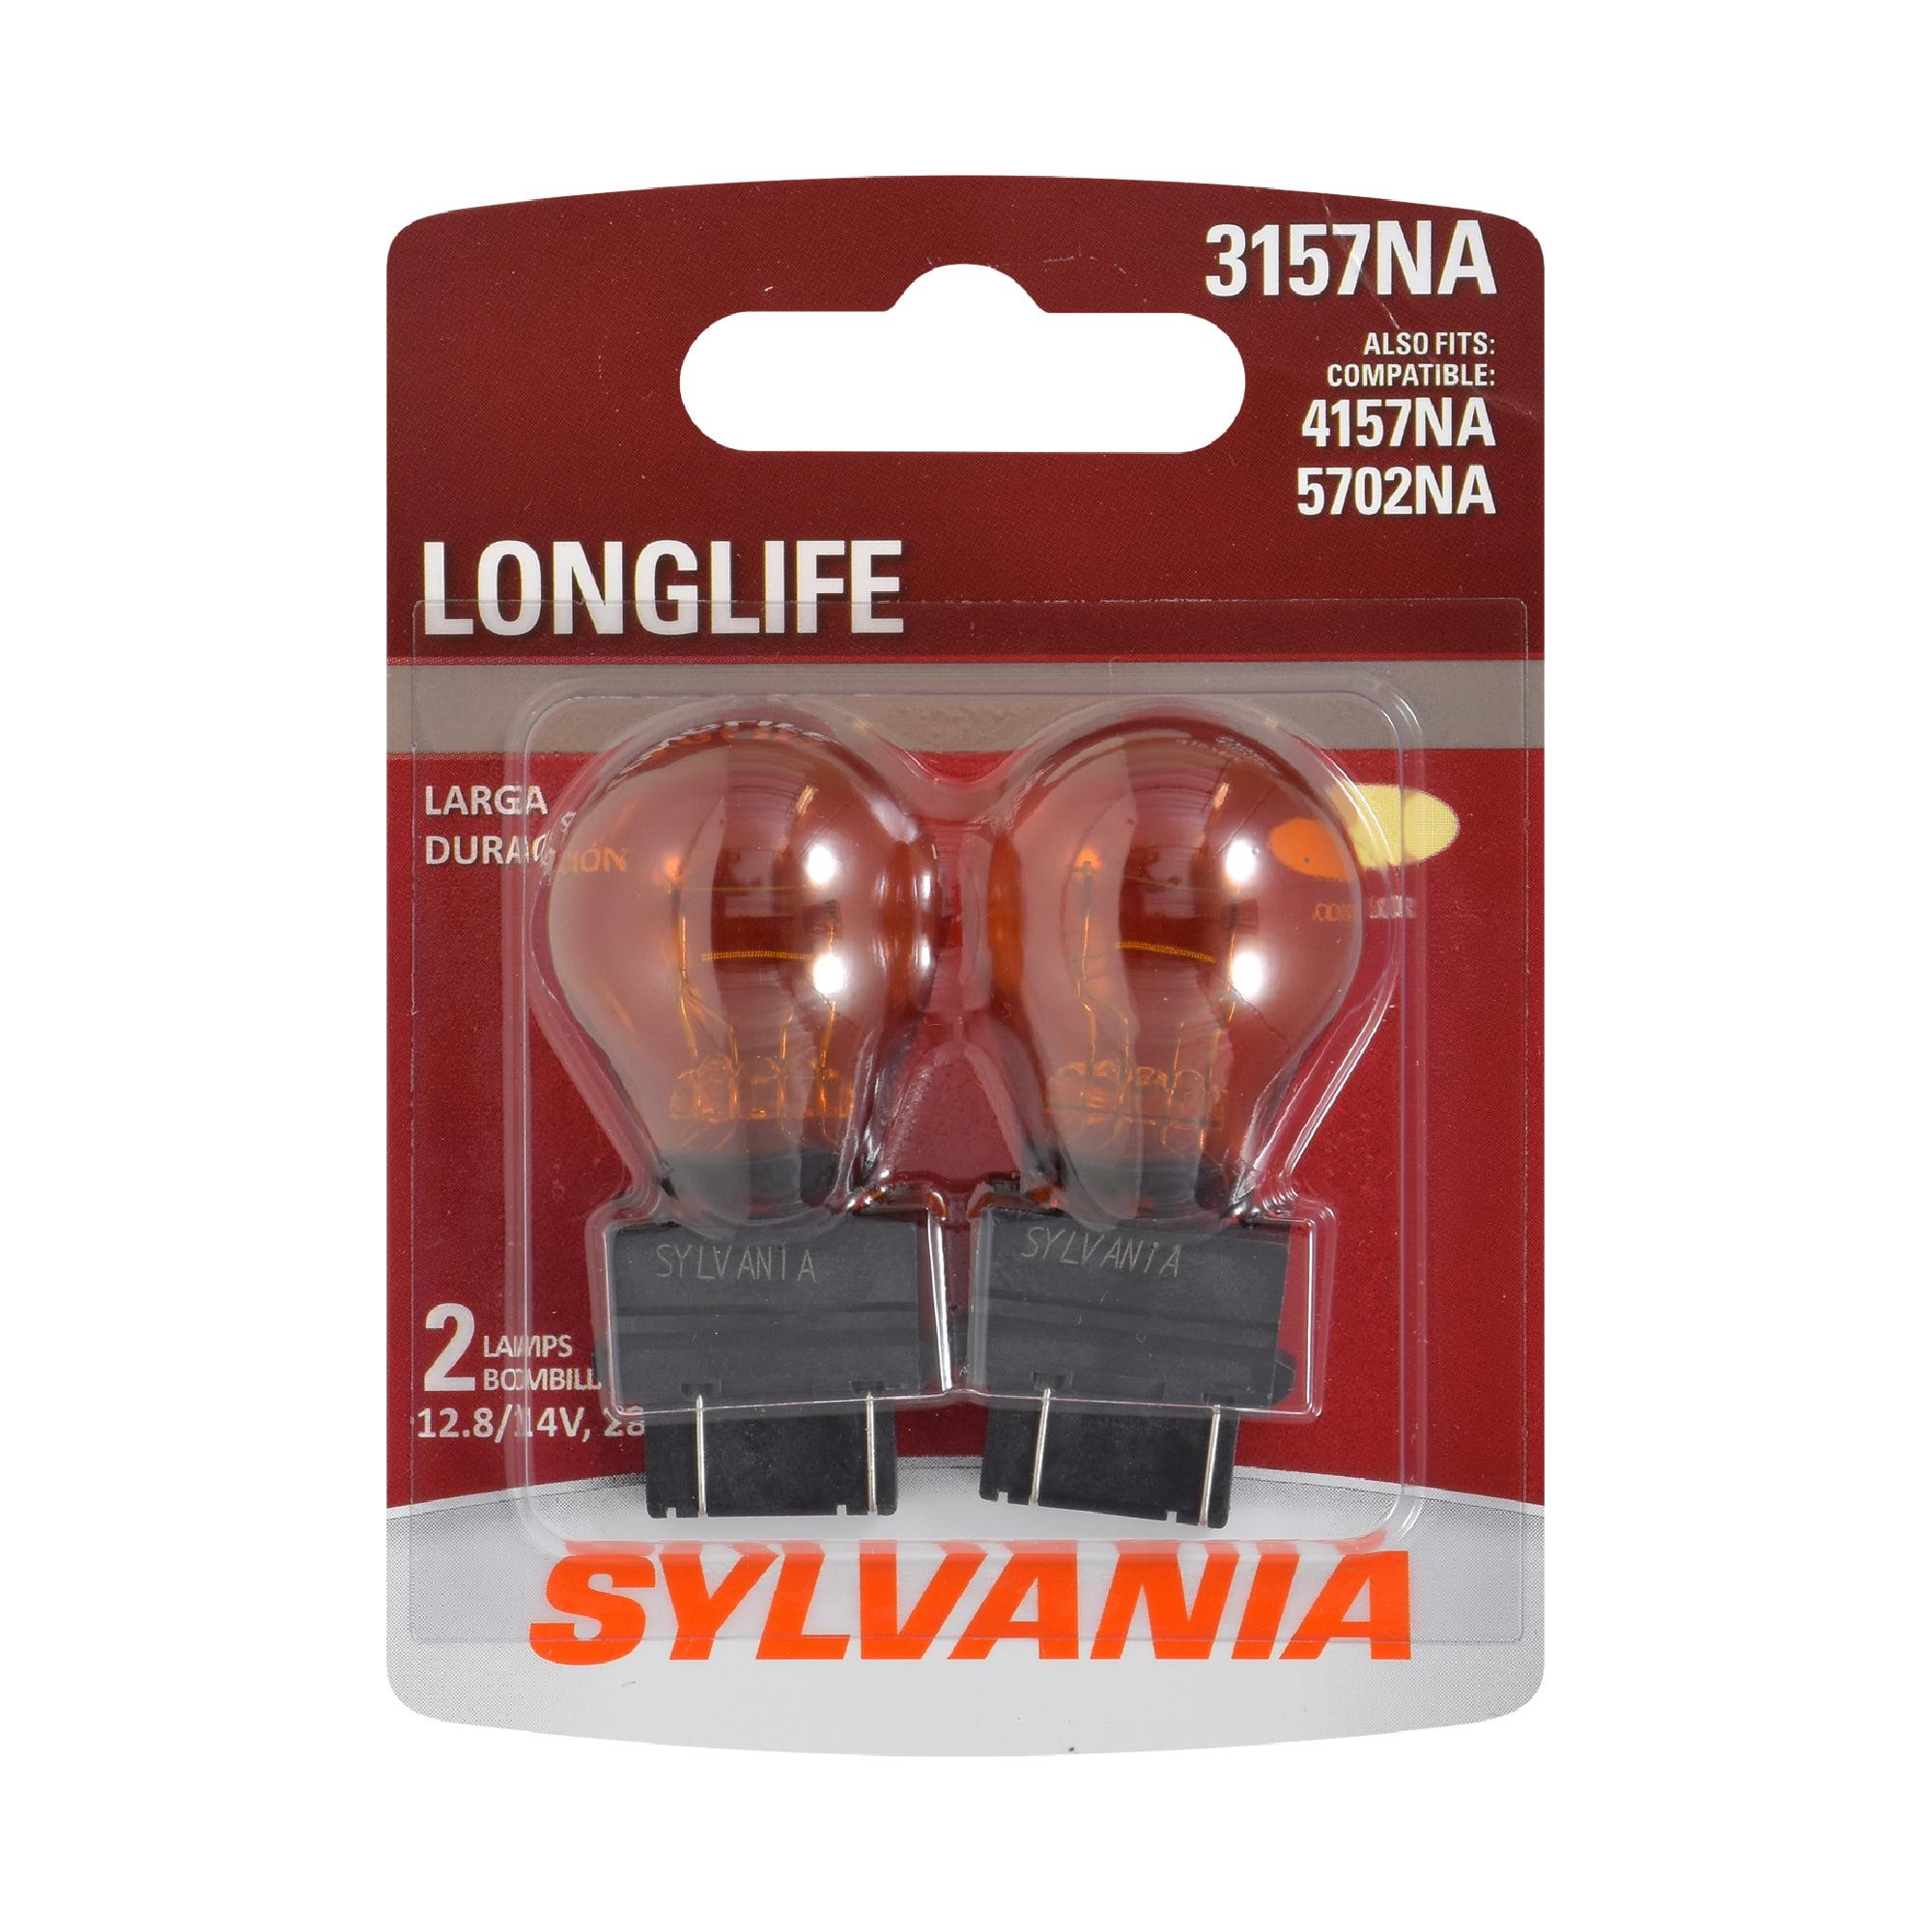 SYLVANIA 3156 Long Life Miniature Bulb, Contains 10 Bulbs